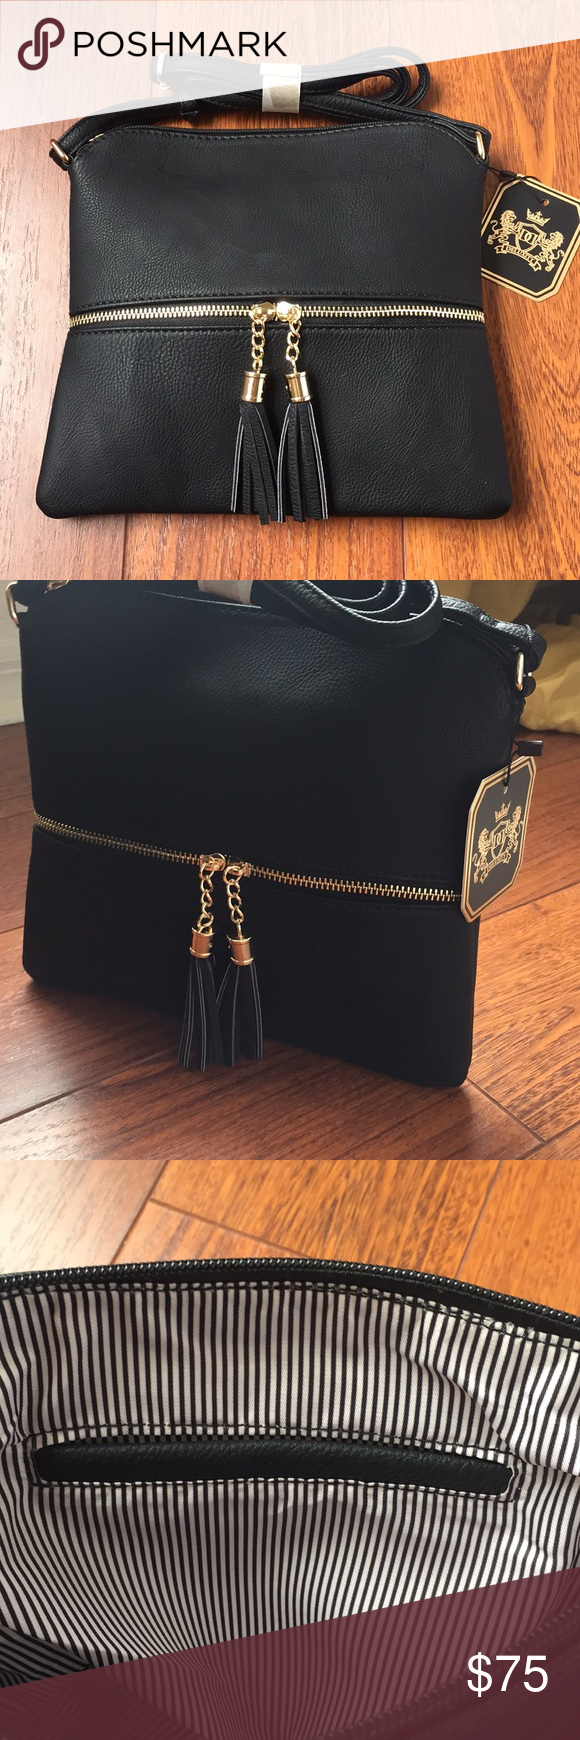 9dc14823657ffa NWT MKII Sadie Tassel Crossbody bag Never been used! This beautiful black Crossbody  bag with